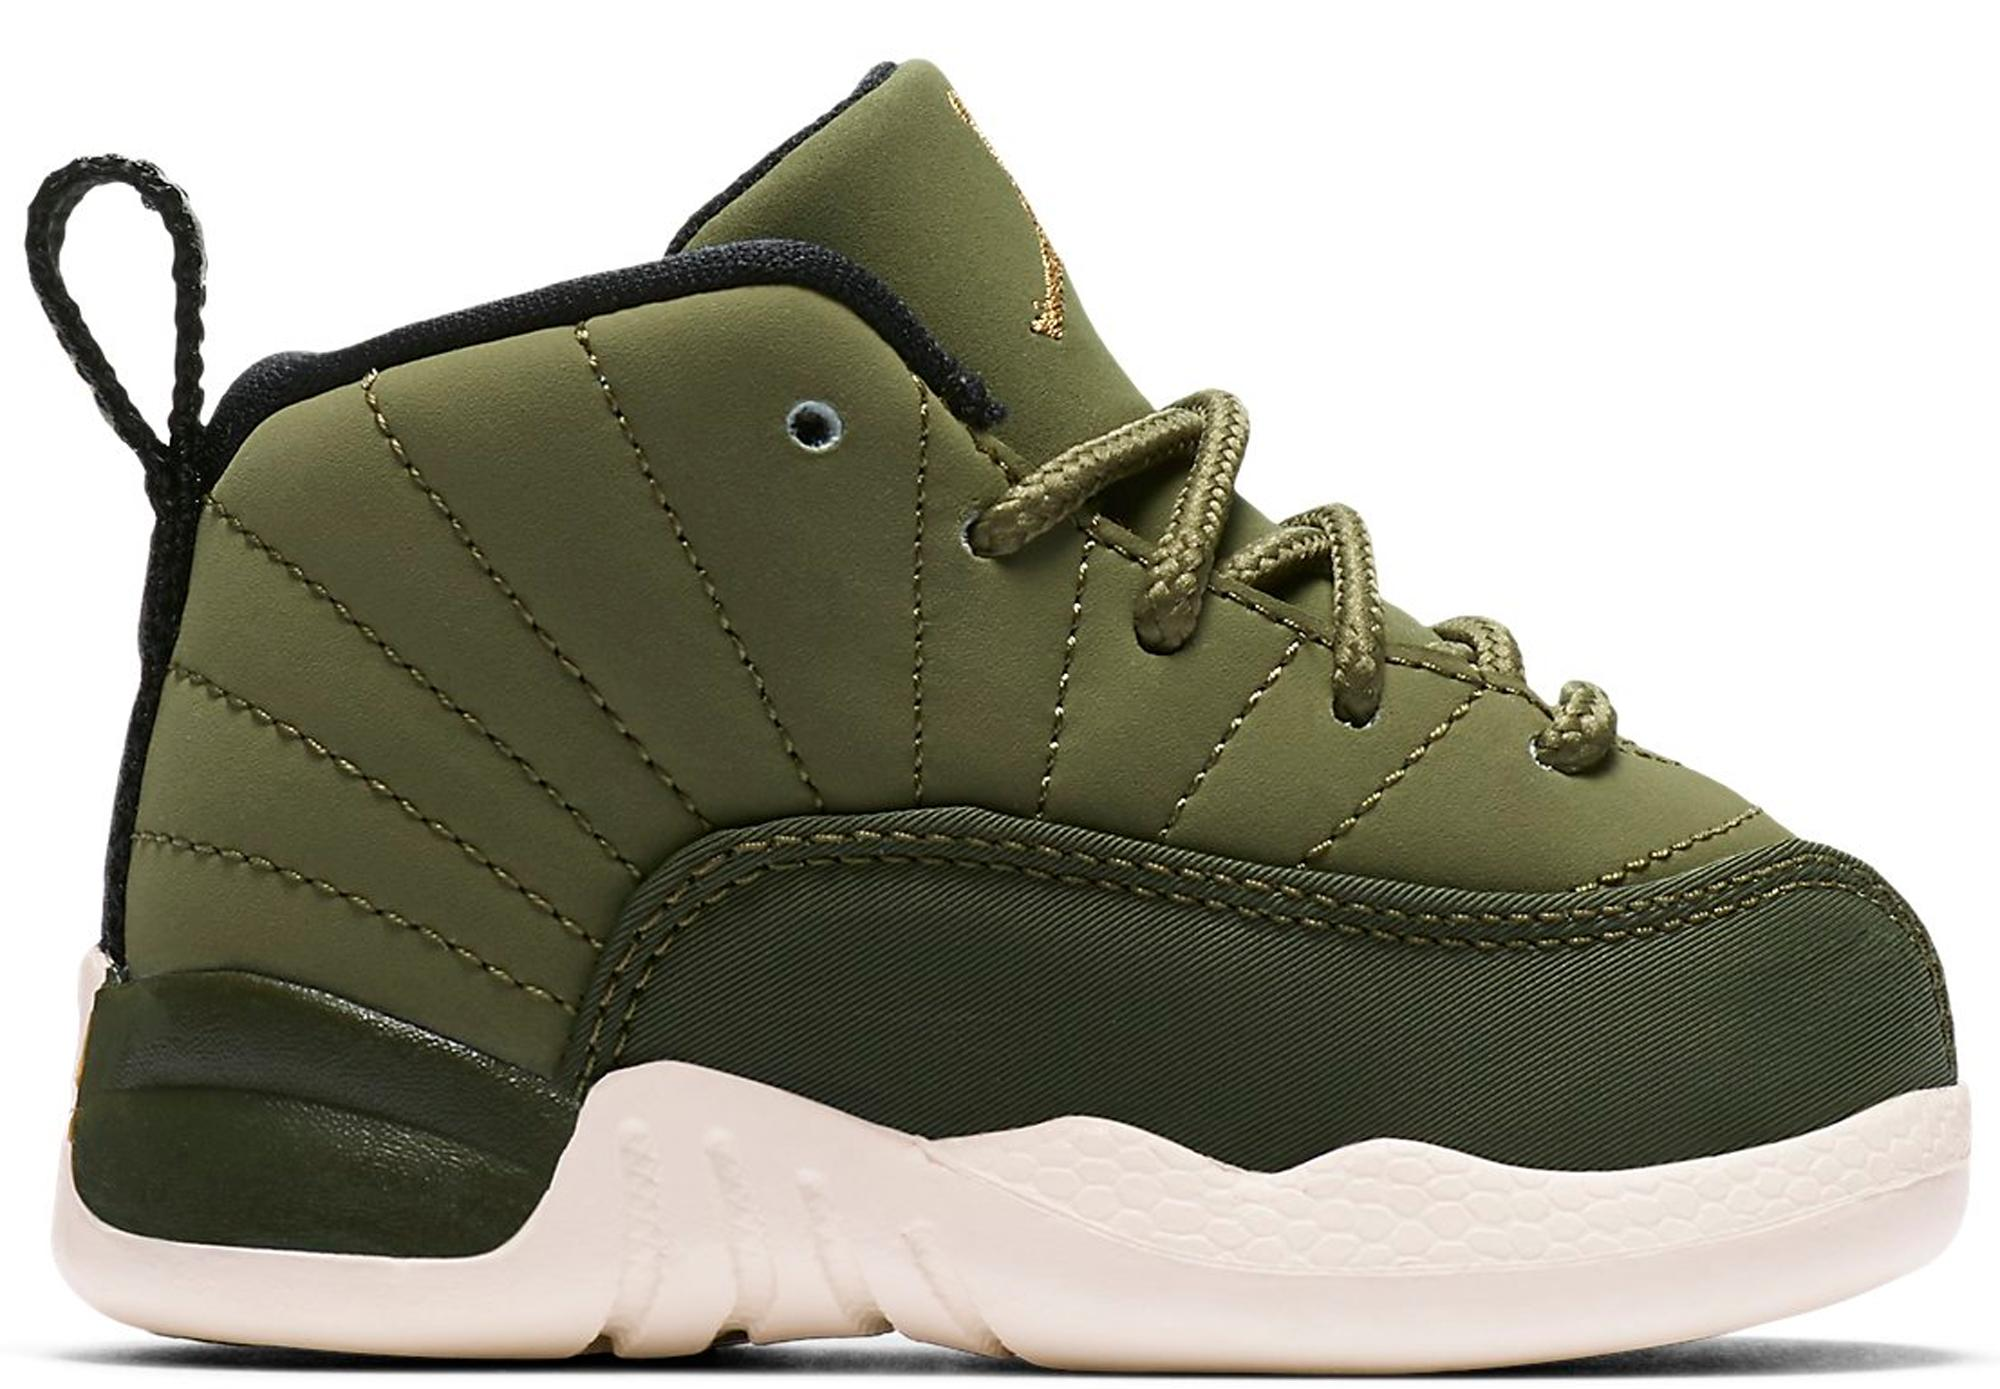 af3ec42f5512c5 Lyst - Nike 12 Retro Chris Paul Class Of 2003 (td) in Green for Men